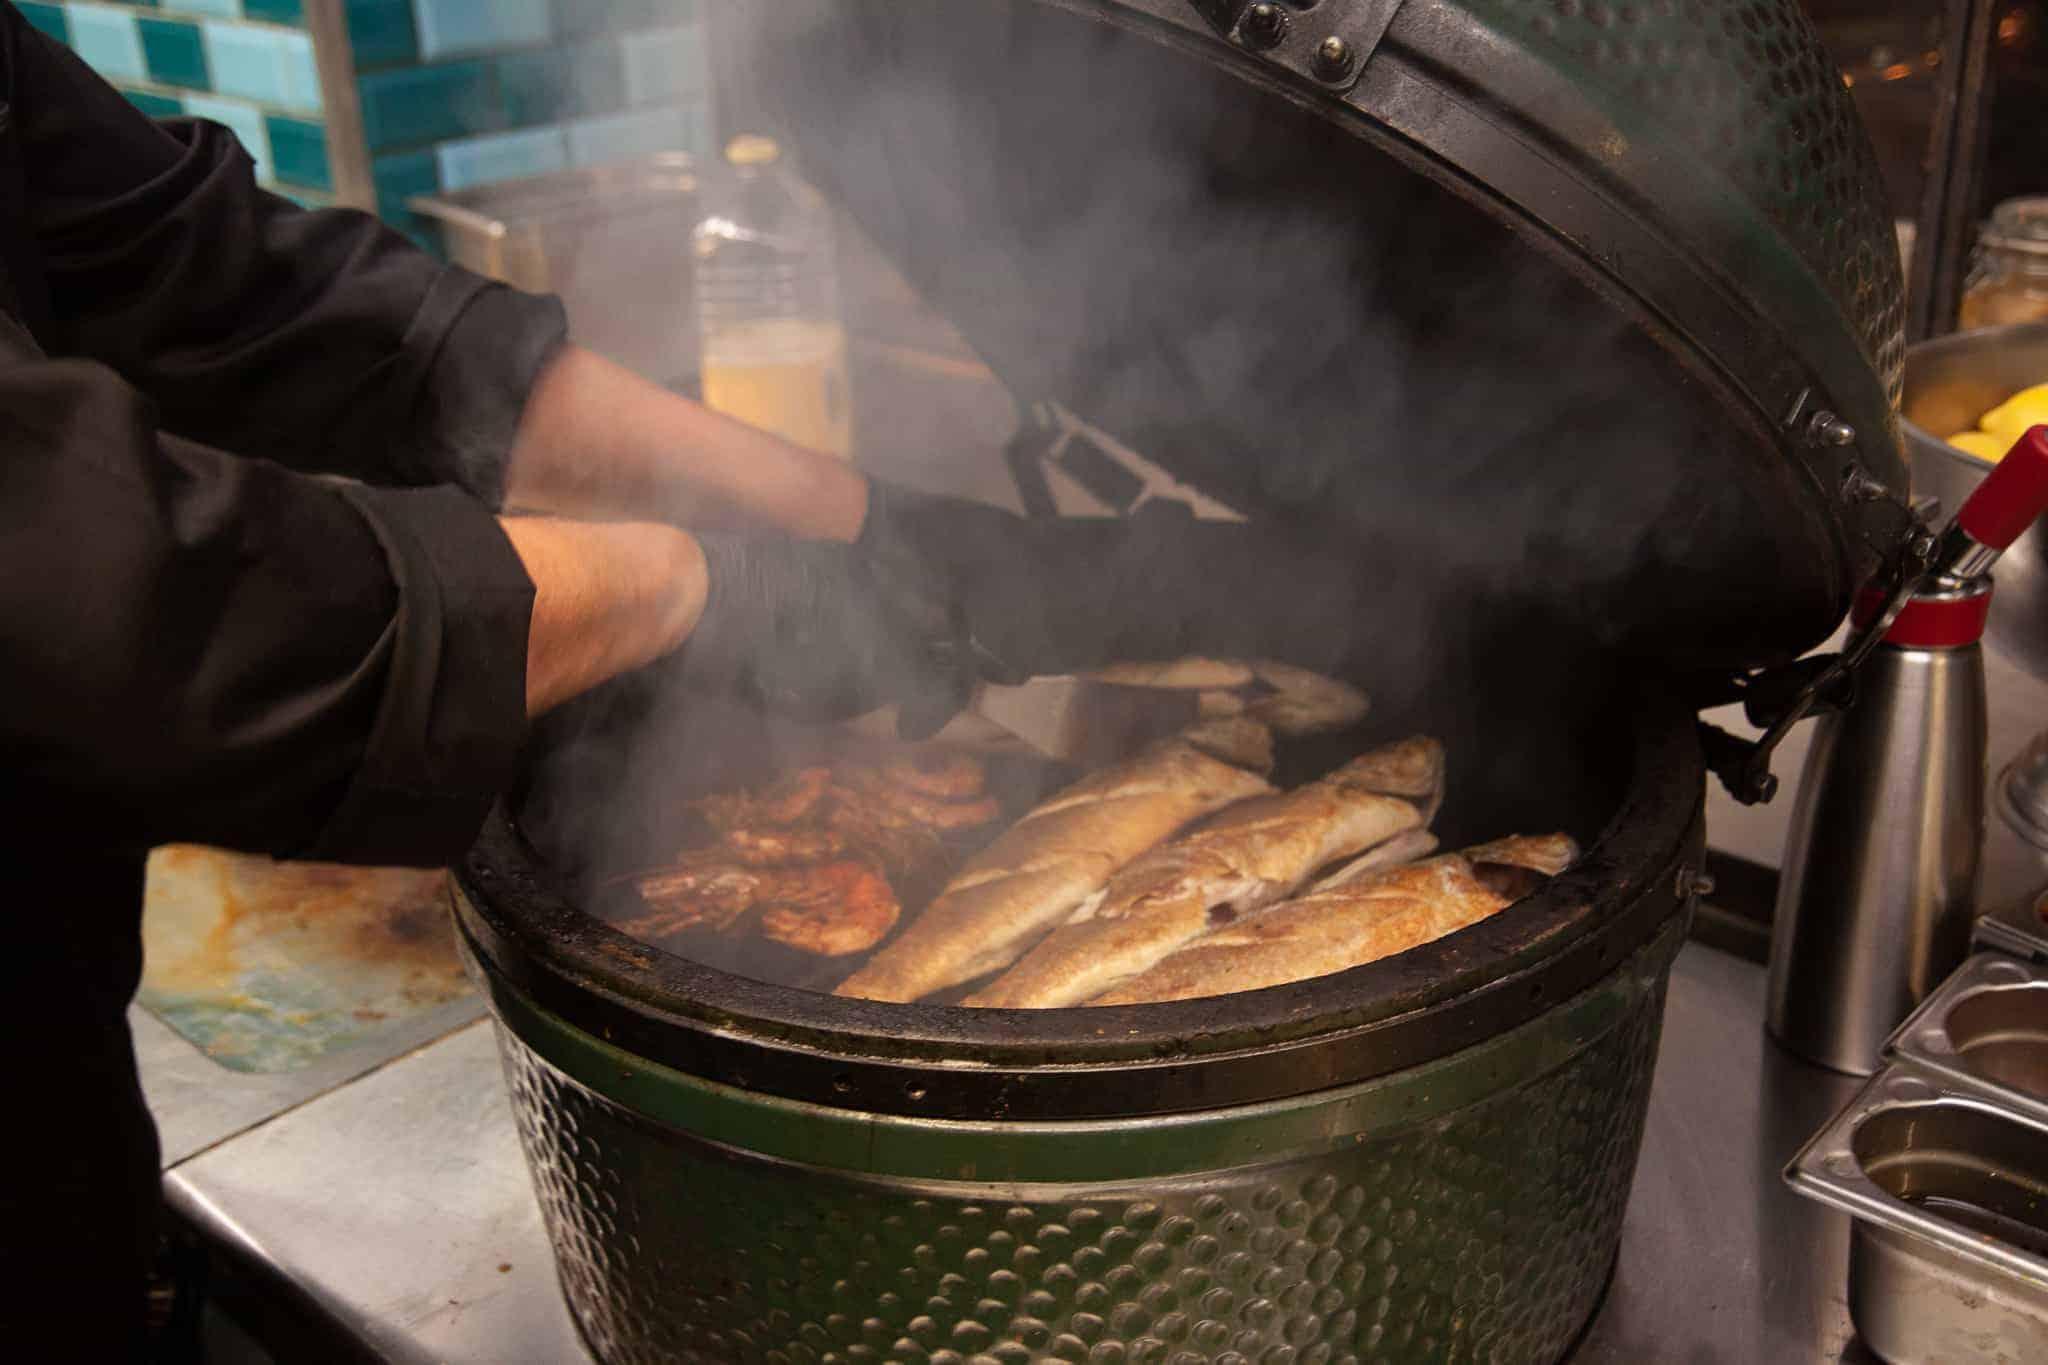 Pesca Amsterdam, vis eten, beleving